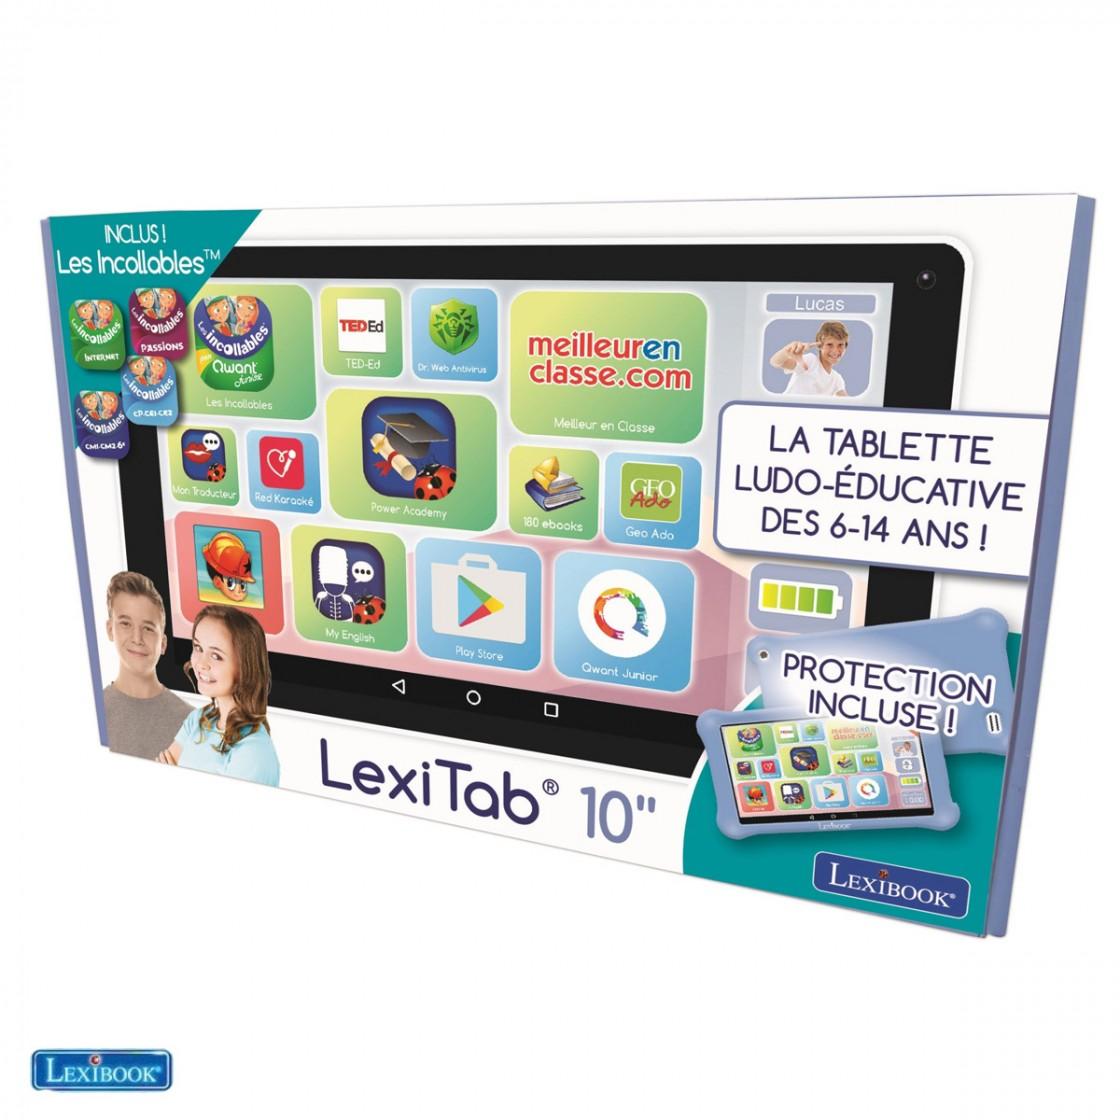 lexitab 10 protection